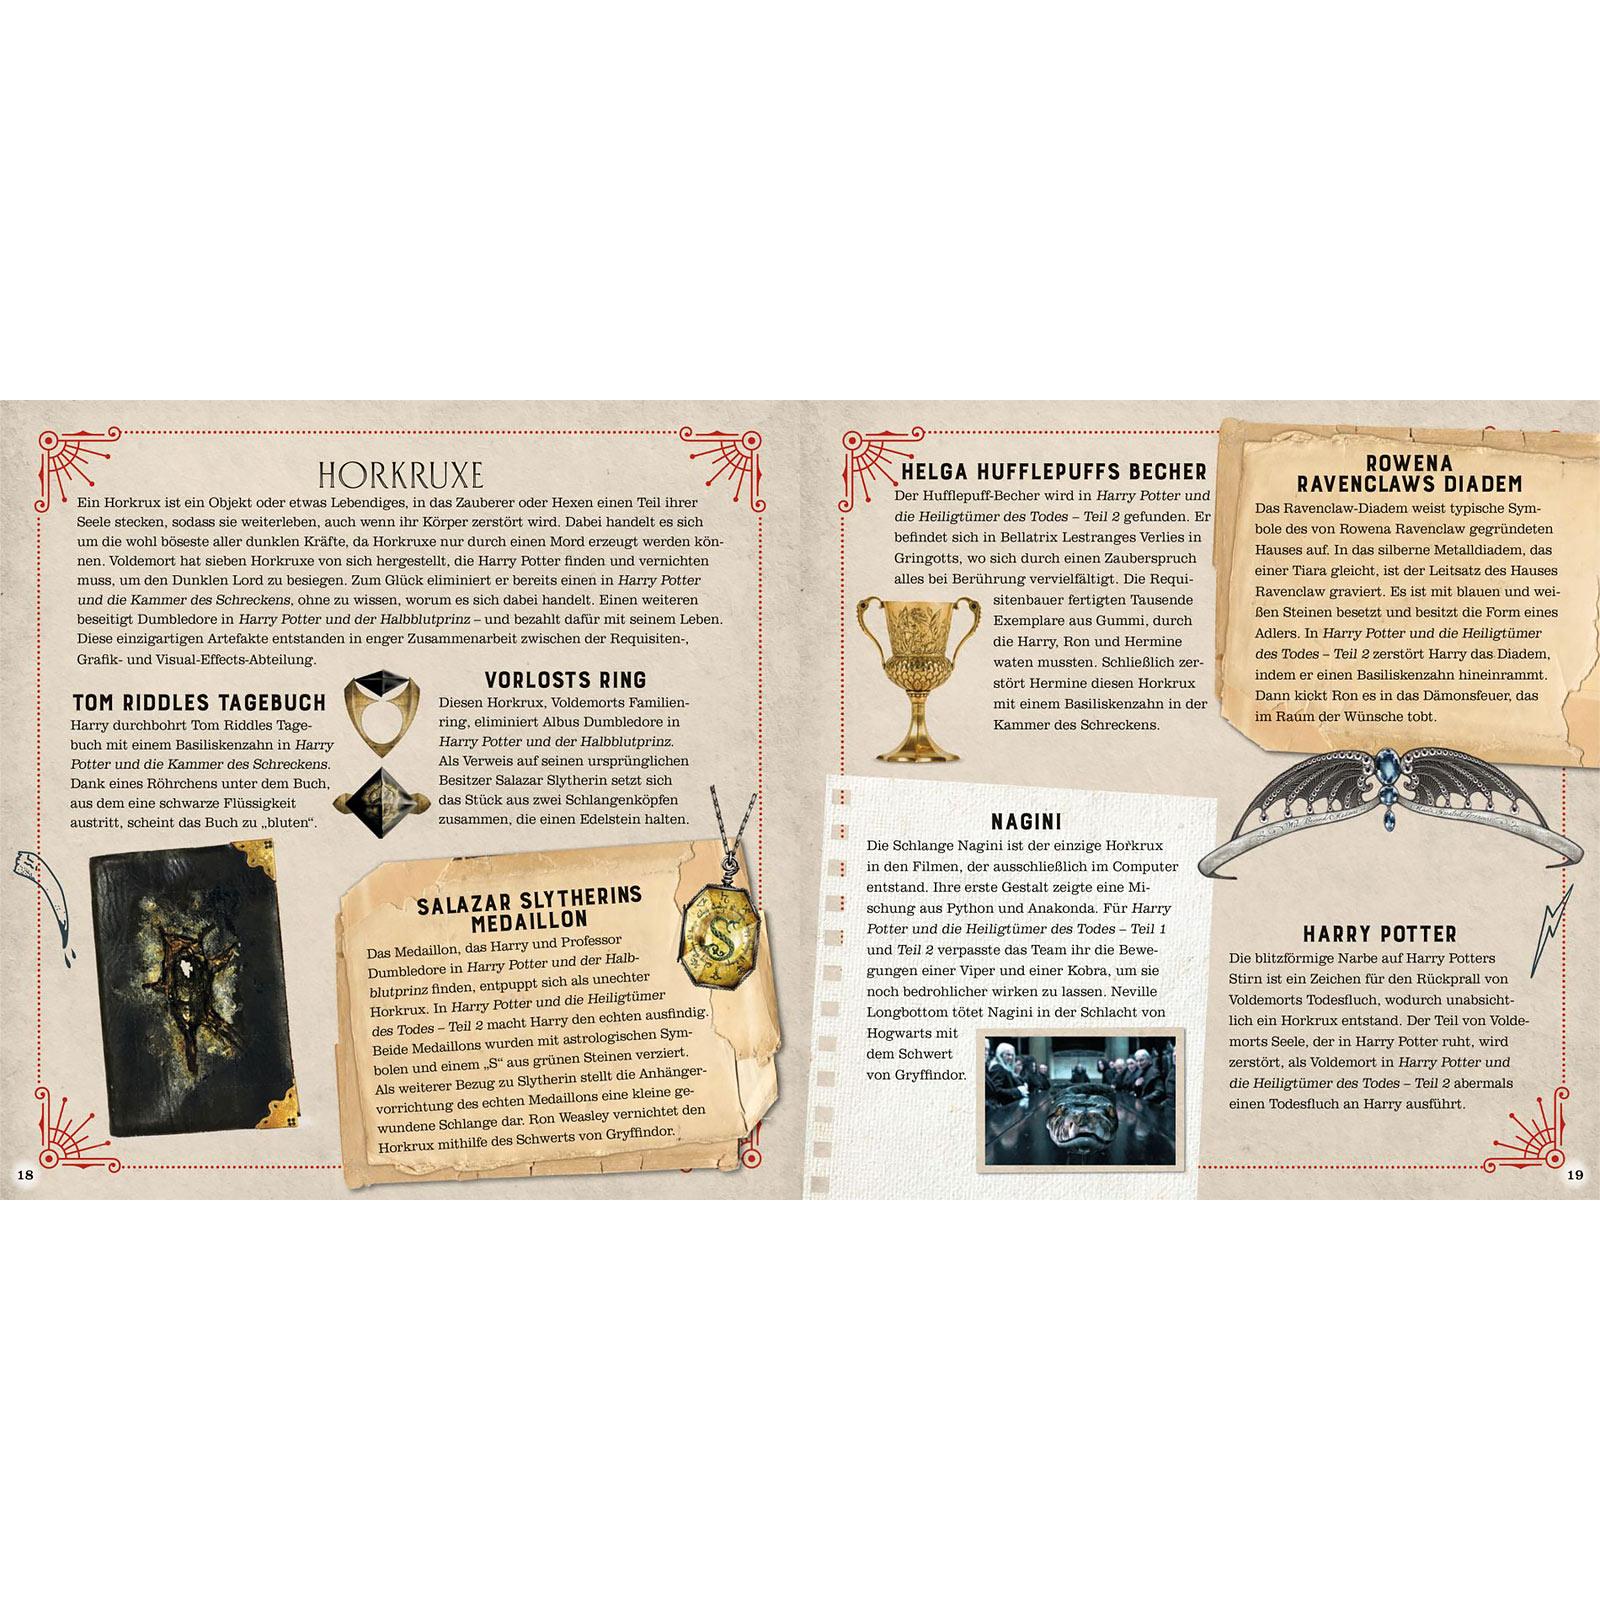 J. K. Rowlings Wizarding World - Die dunklen Künste